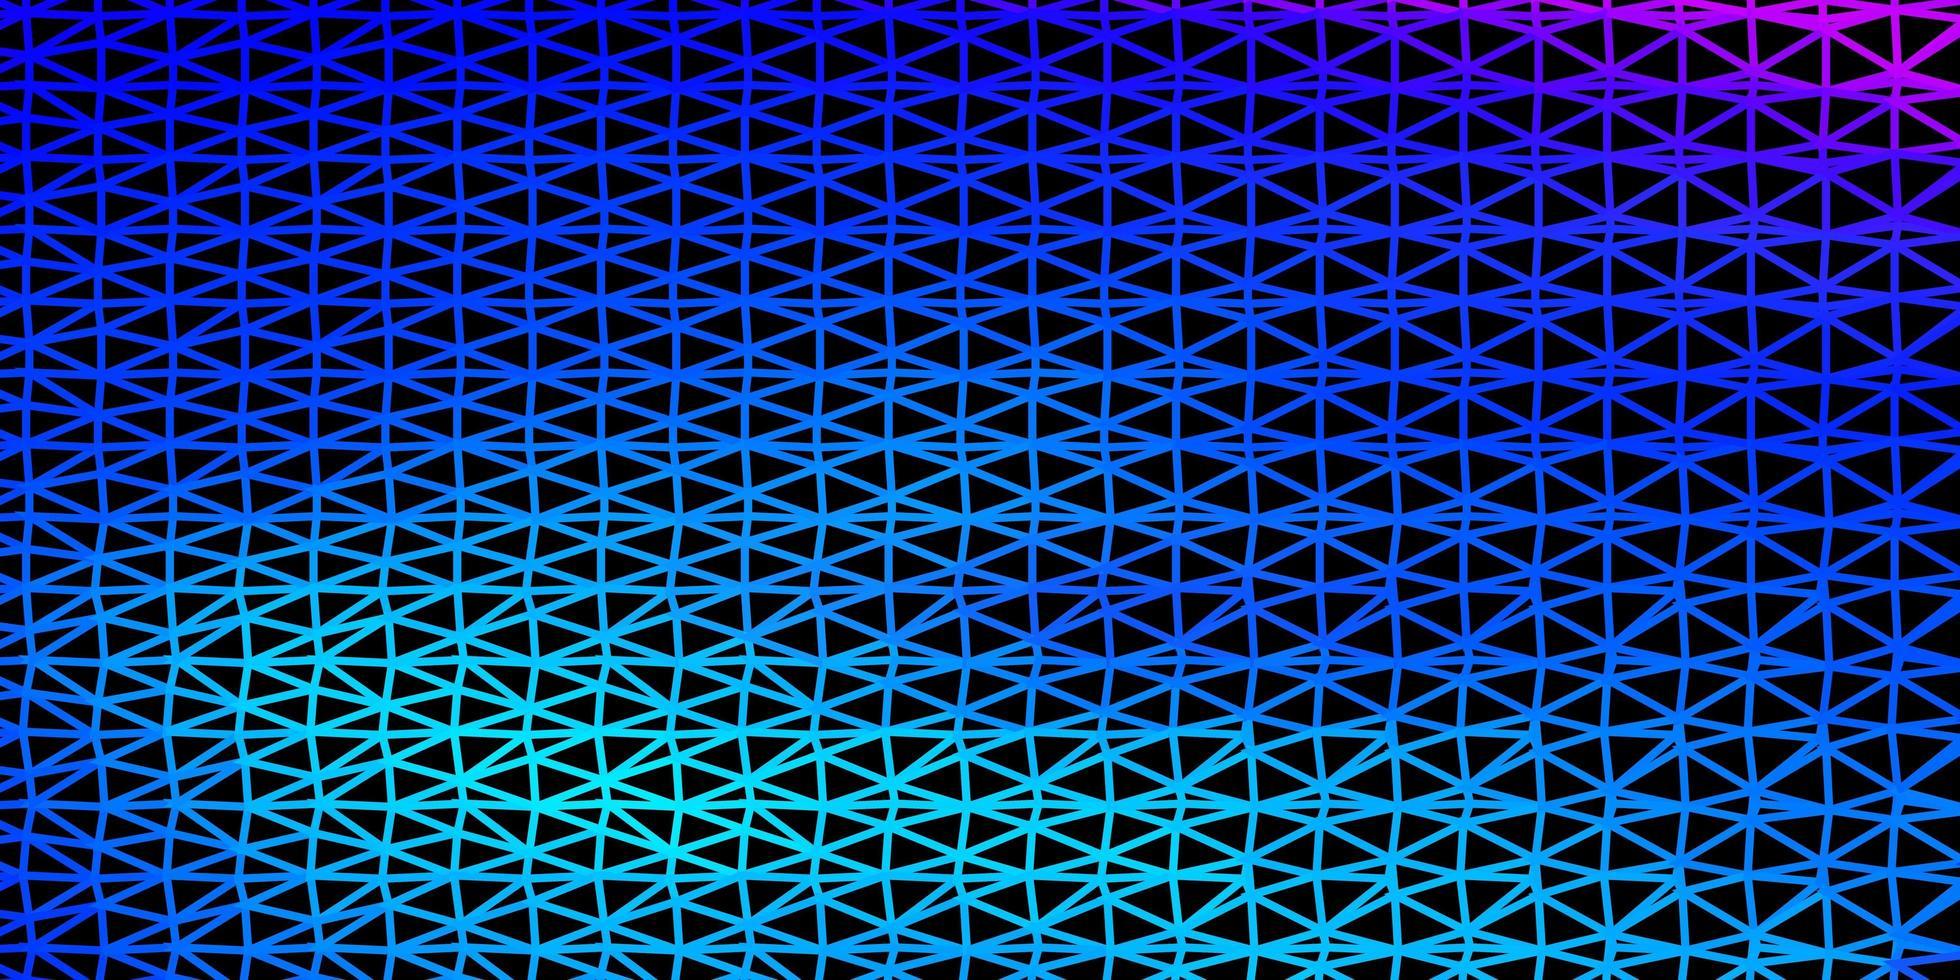 fond de mosaïque triangle vecteur rose clair, bleu.